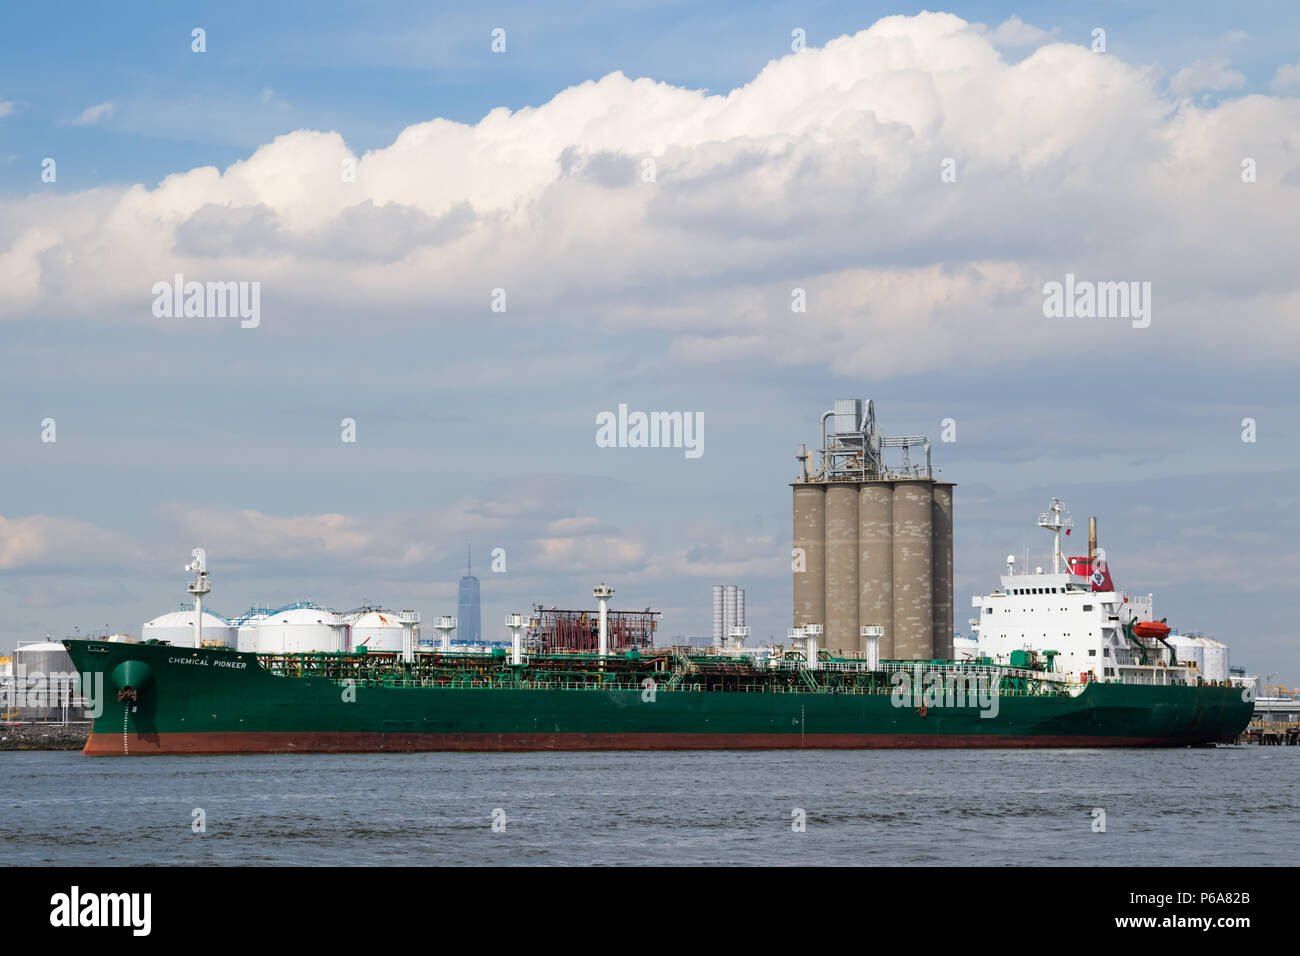 US Shipping Corporation Petroleum tanker Chemische Pioneer günstig entlang den Kill Van Kull in Bayonne NJ Stockfoto